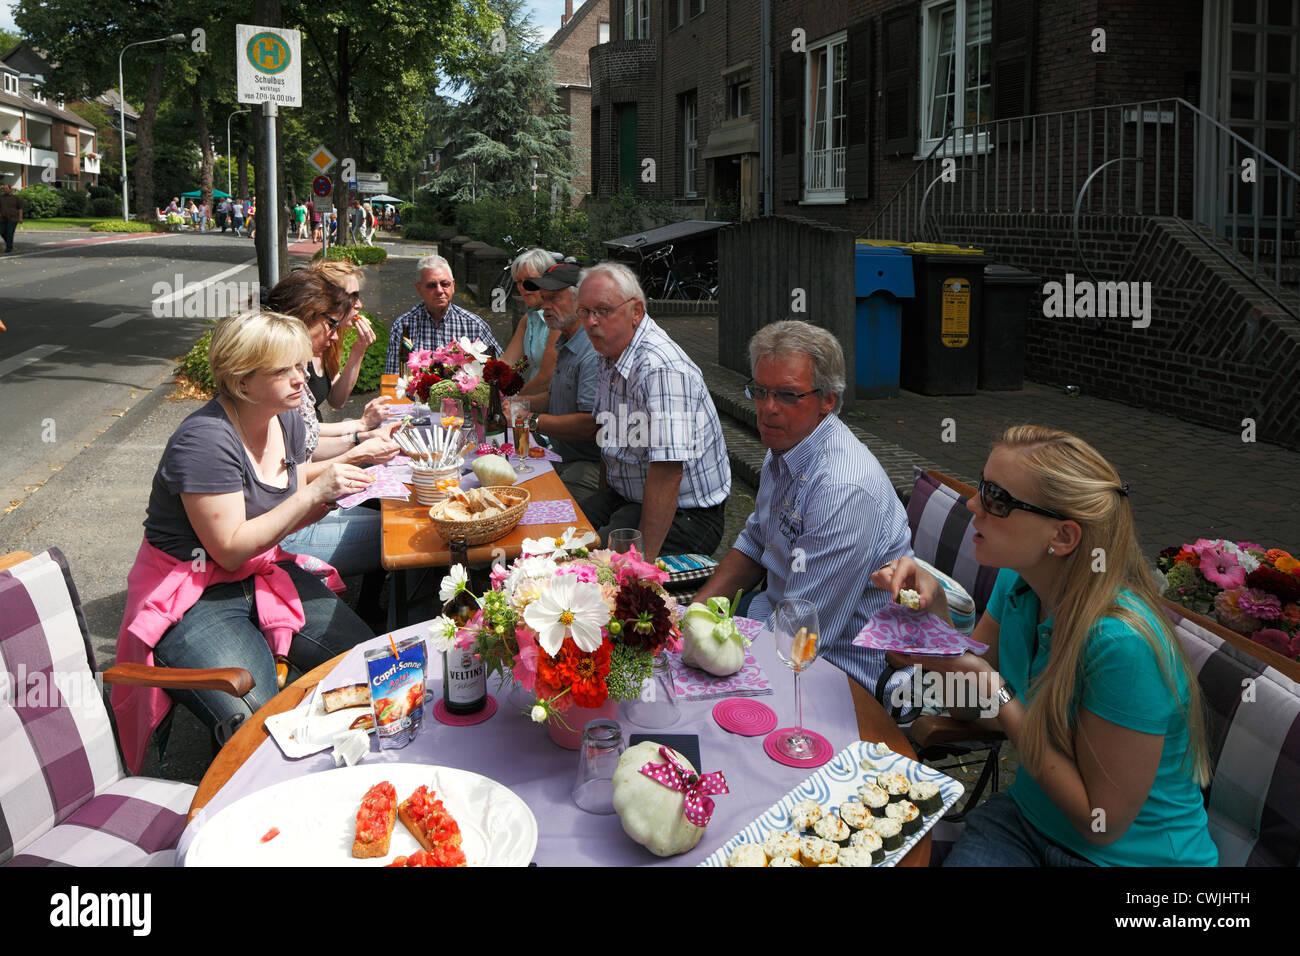 D-Krefeld, Rhine, Lower Rhine, Rhineland, North Rhine-Westphalia, NRW, Friedrich-Ebert-Strasse, street party 'Summer - Stock Image